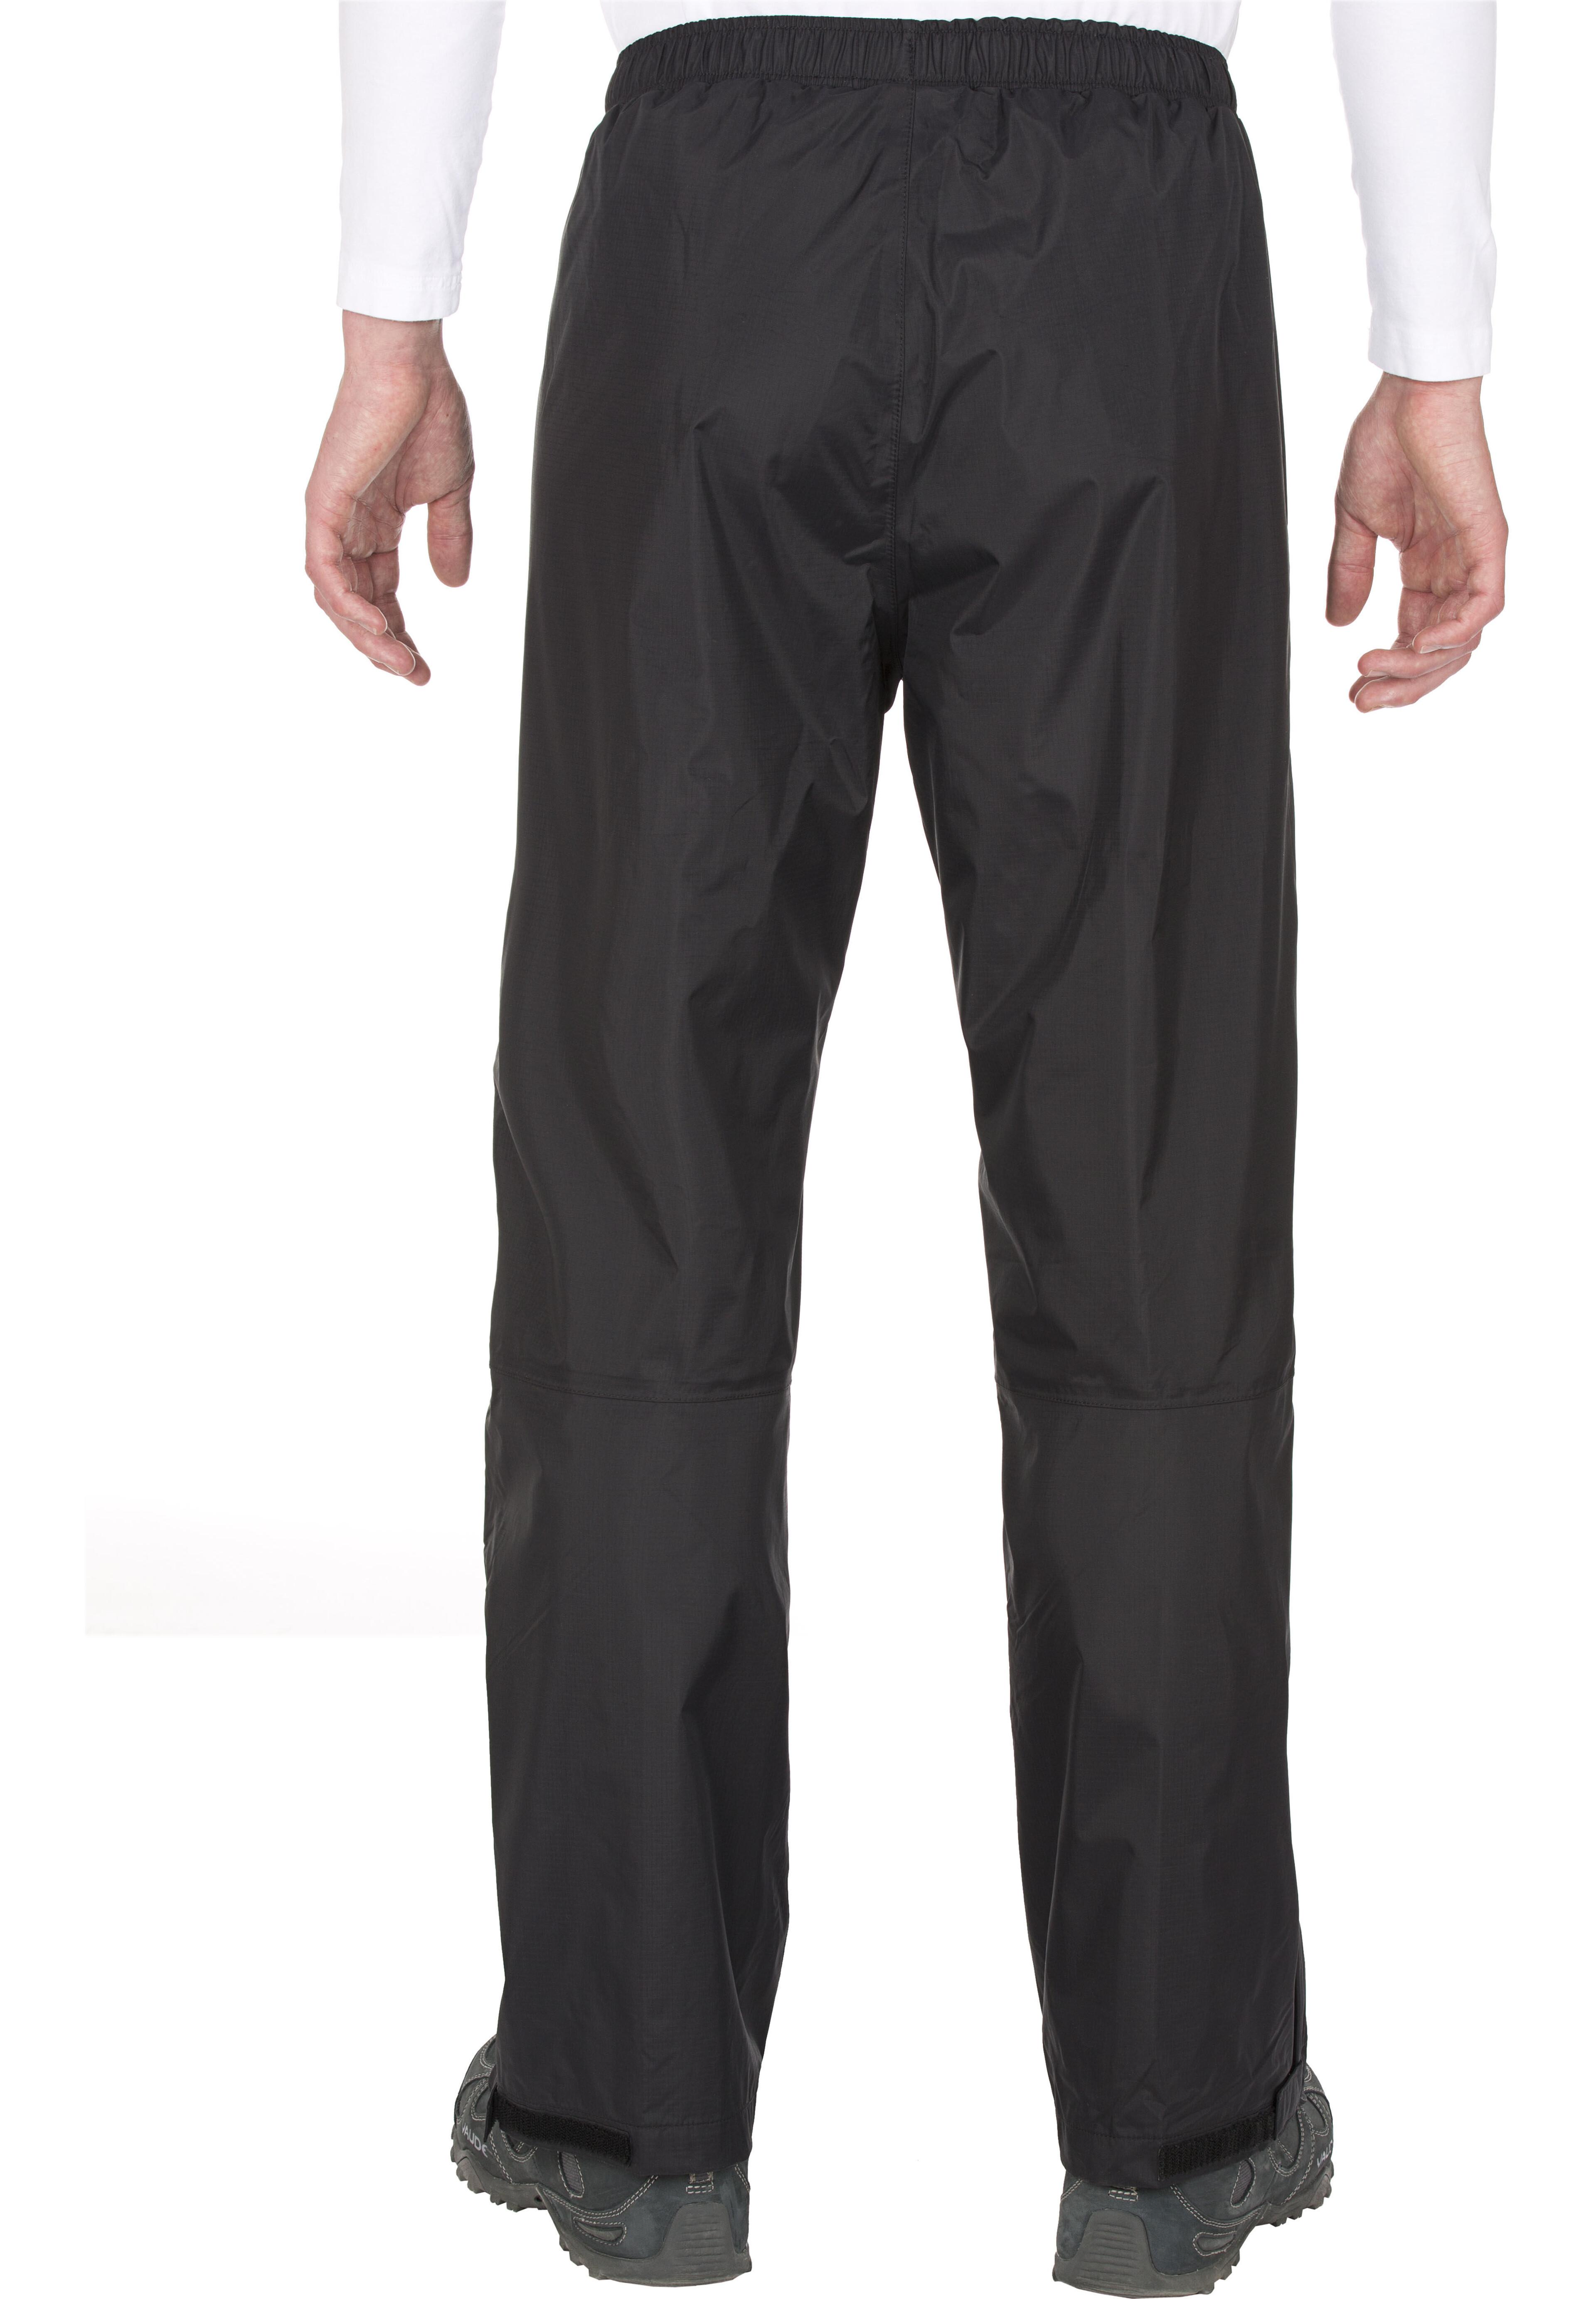 6c10d694 The North Face Resolve Pants Men tnf black at Addnature.co.uk